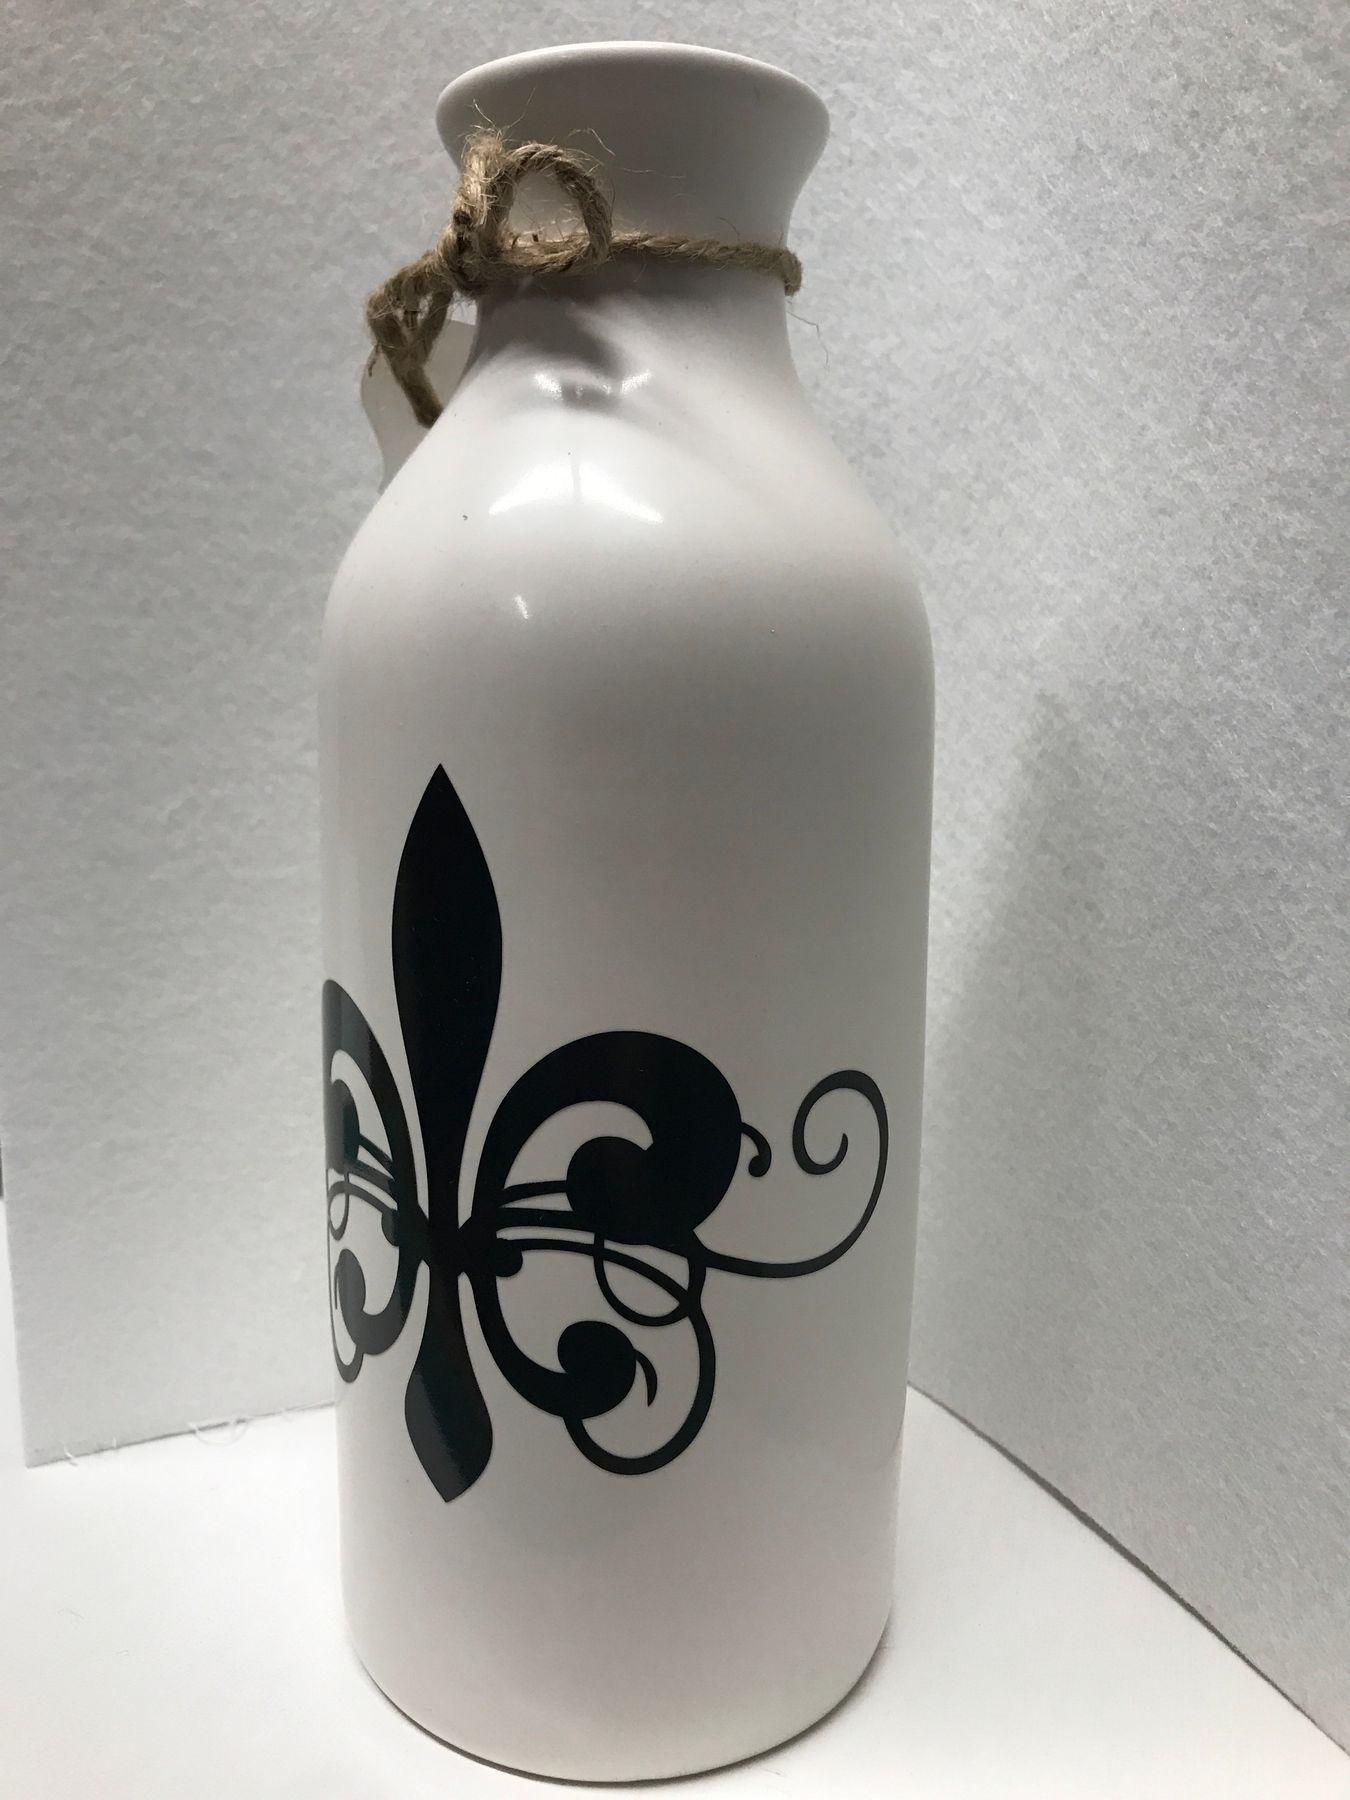 Fleur De Lis Milk Bottle Vase 10 in tall. A charming way